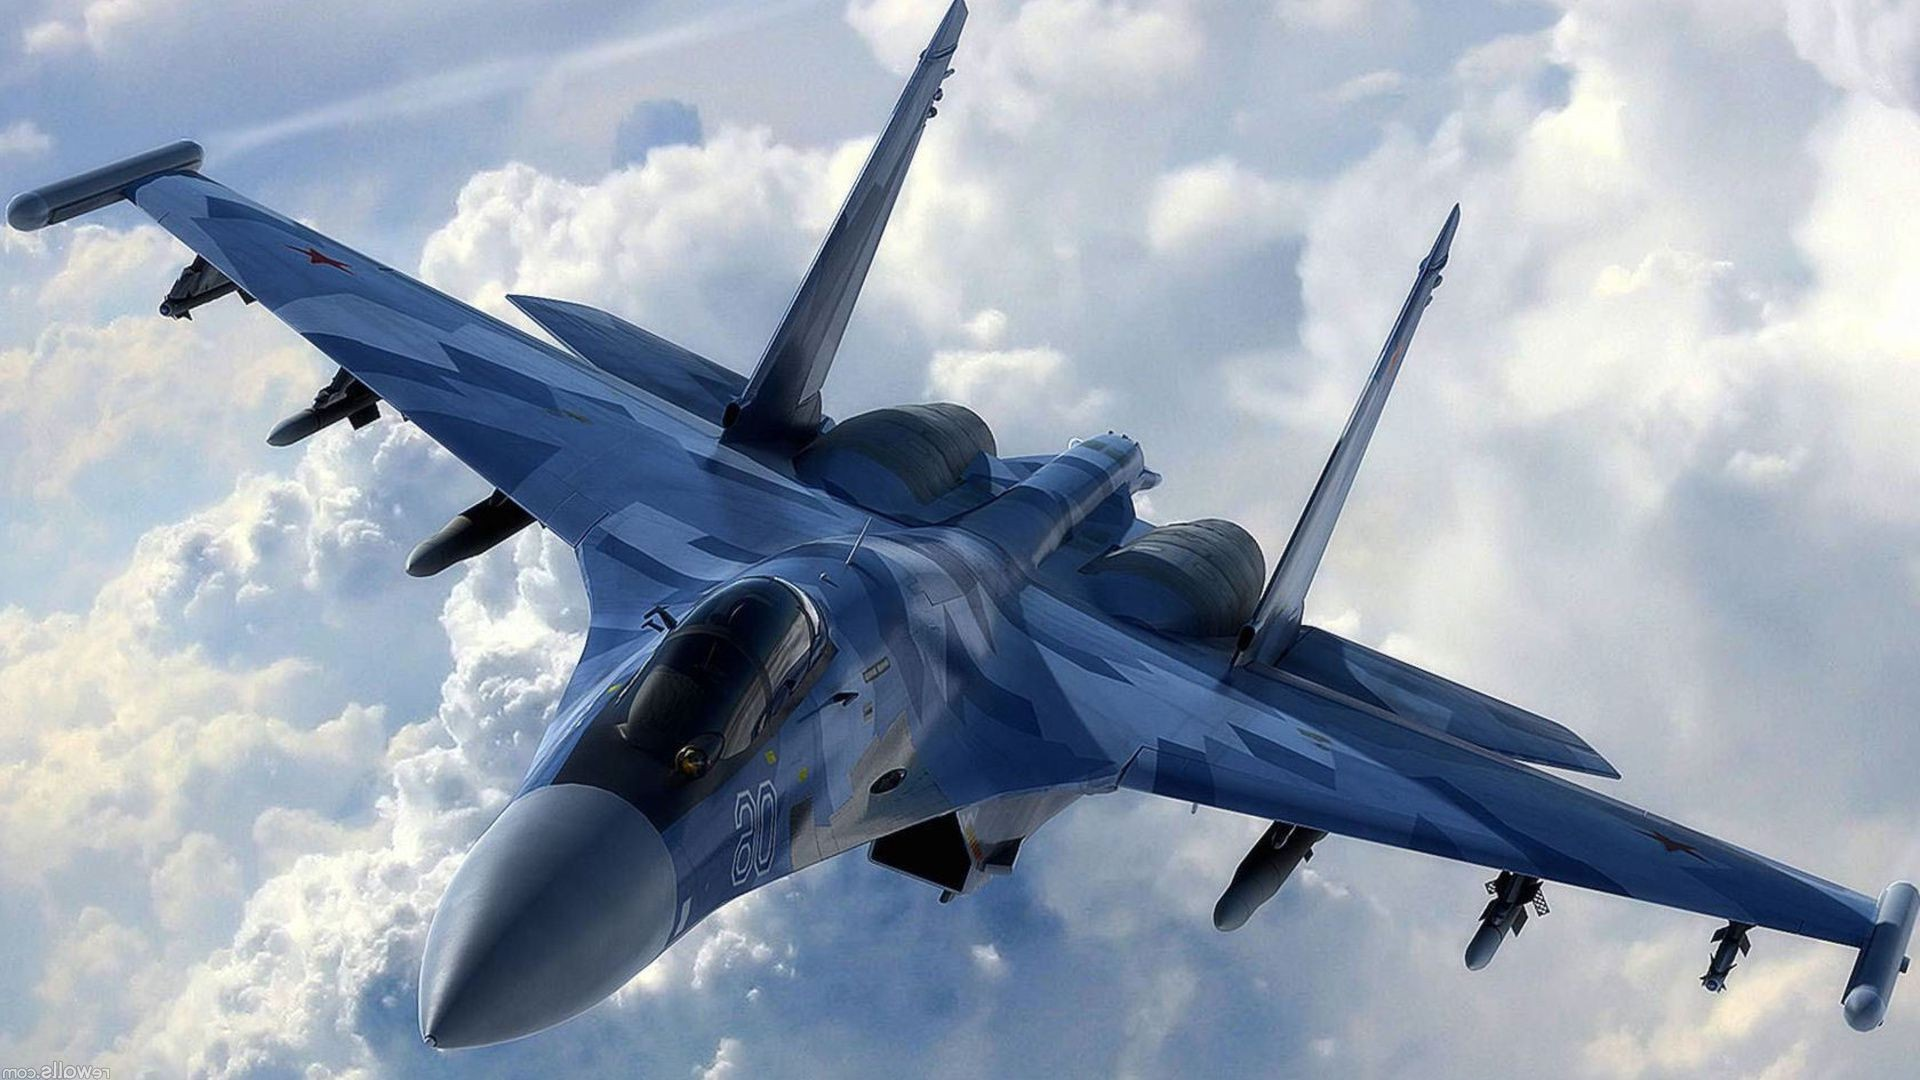 Обои Mcdonnell douglas, истребитель, Самолёт, eagle, Облака. Авиация foto 9